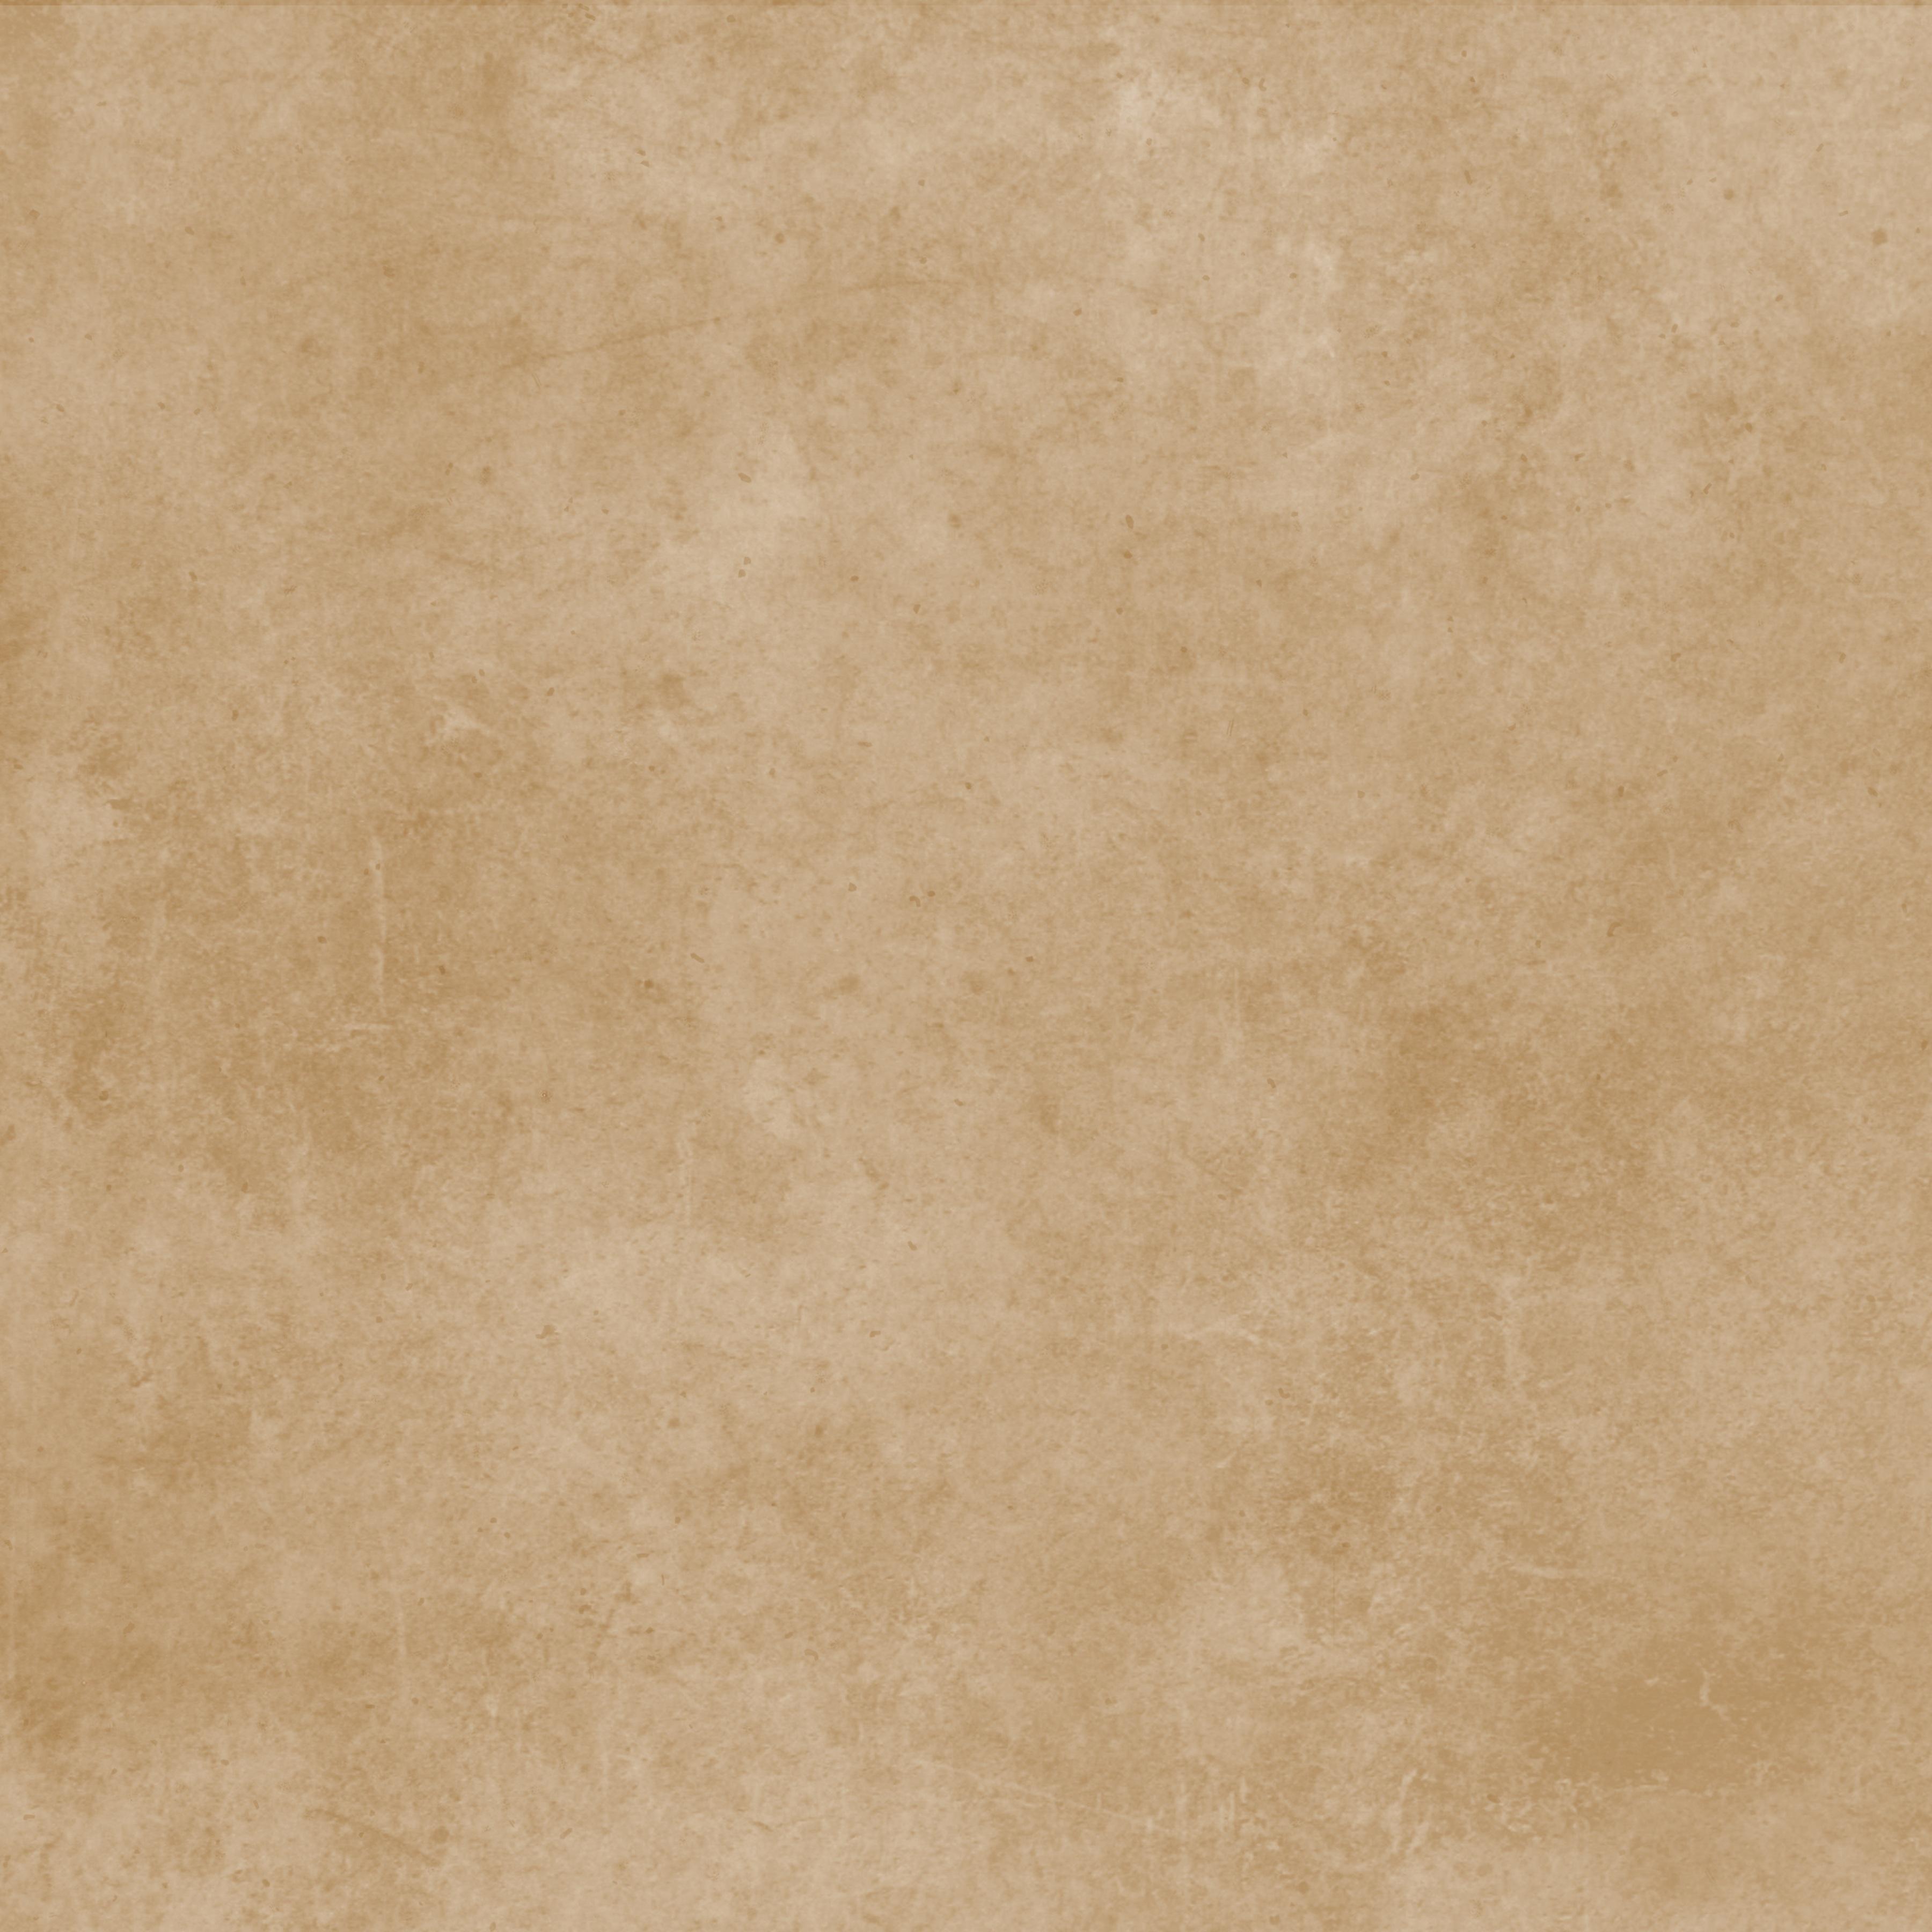 Gambar lantai coklat ubin grunge halaman bahan